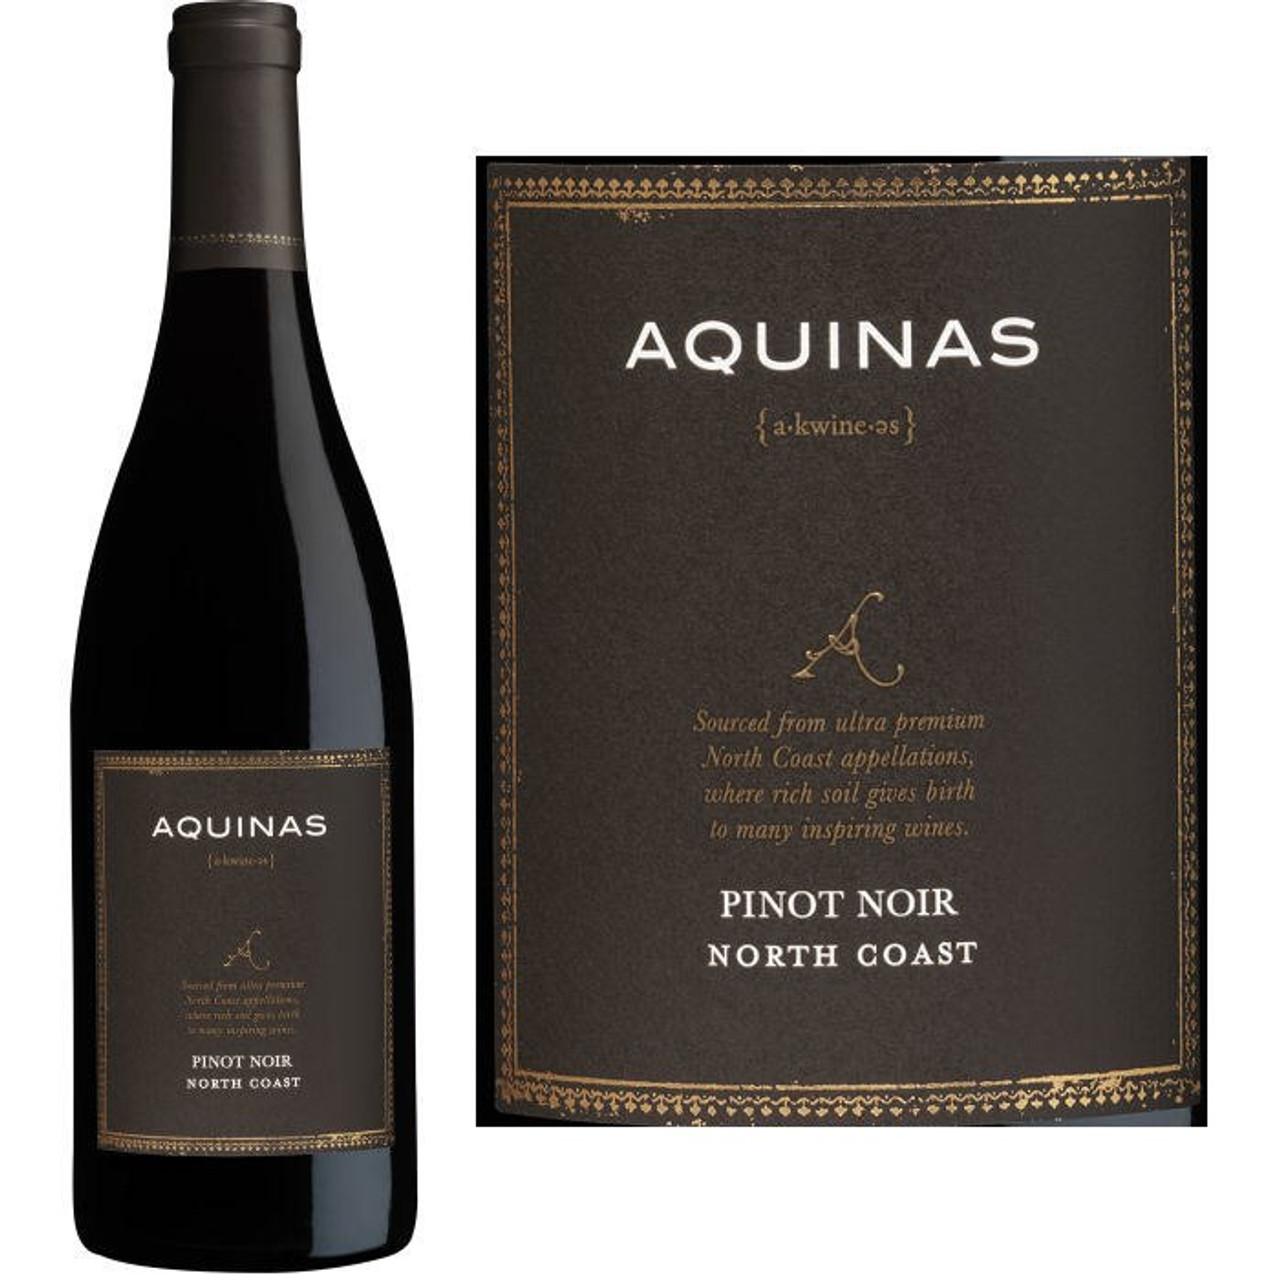 Aquinas North Coast Pinot Noir 2016